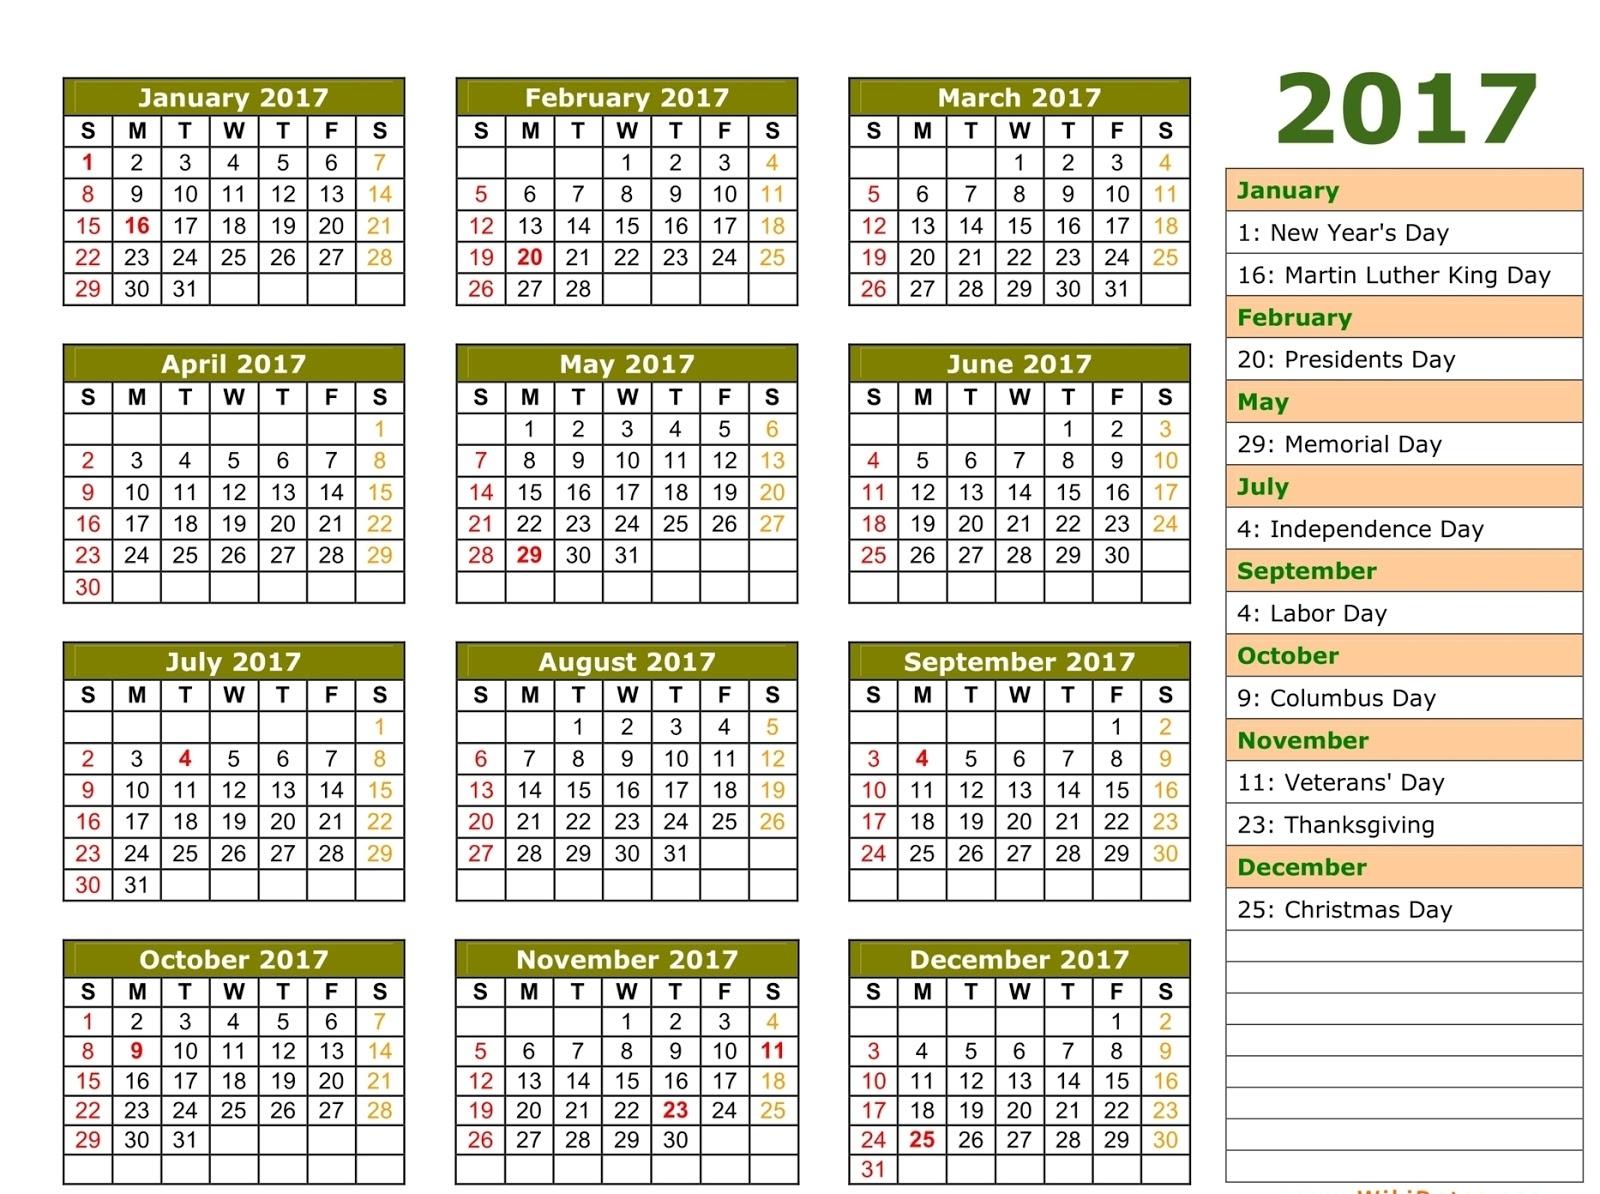 Desk Calendar 2017 Sri Lanka - Diy Projects intended for 2012 Calendar Sri Lanka With All Holidays